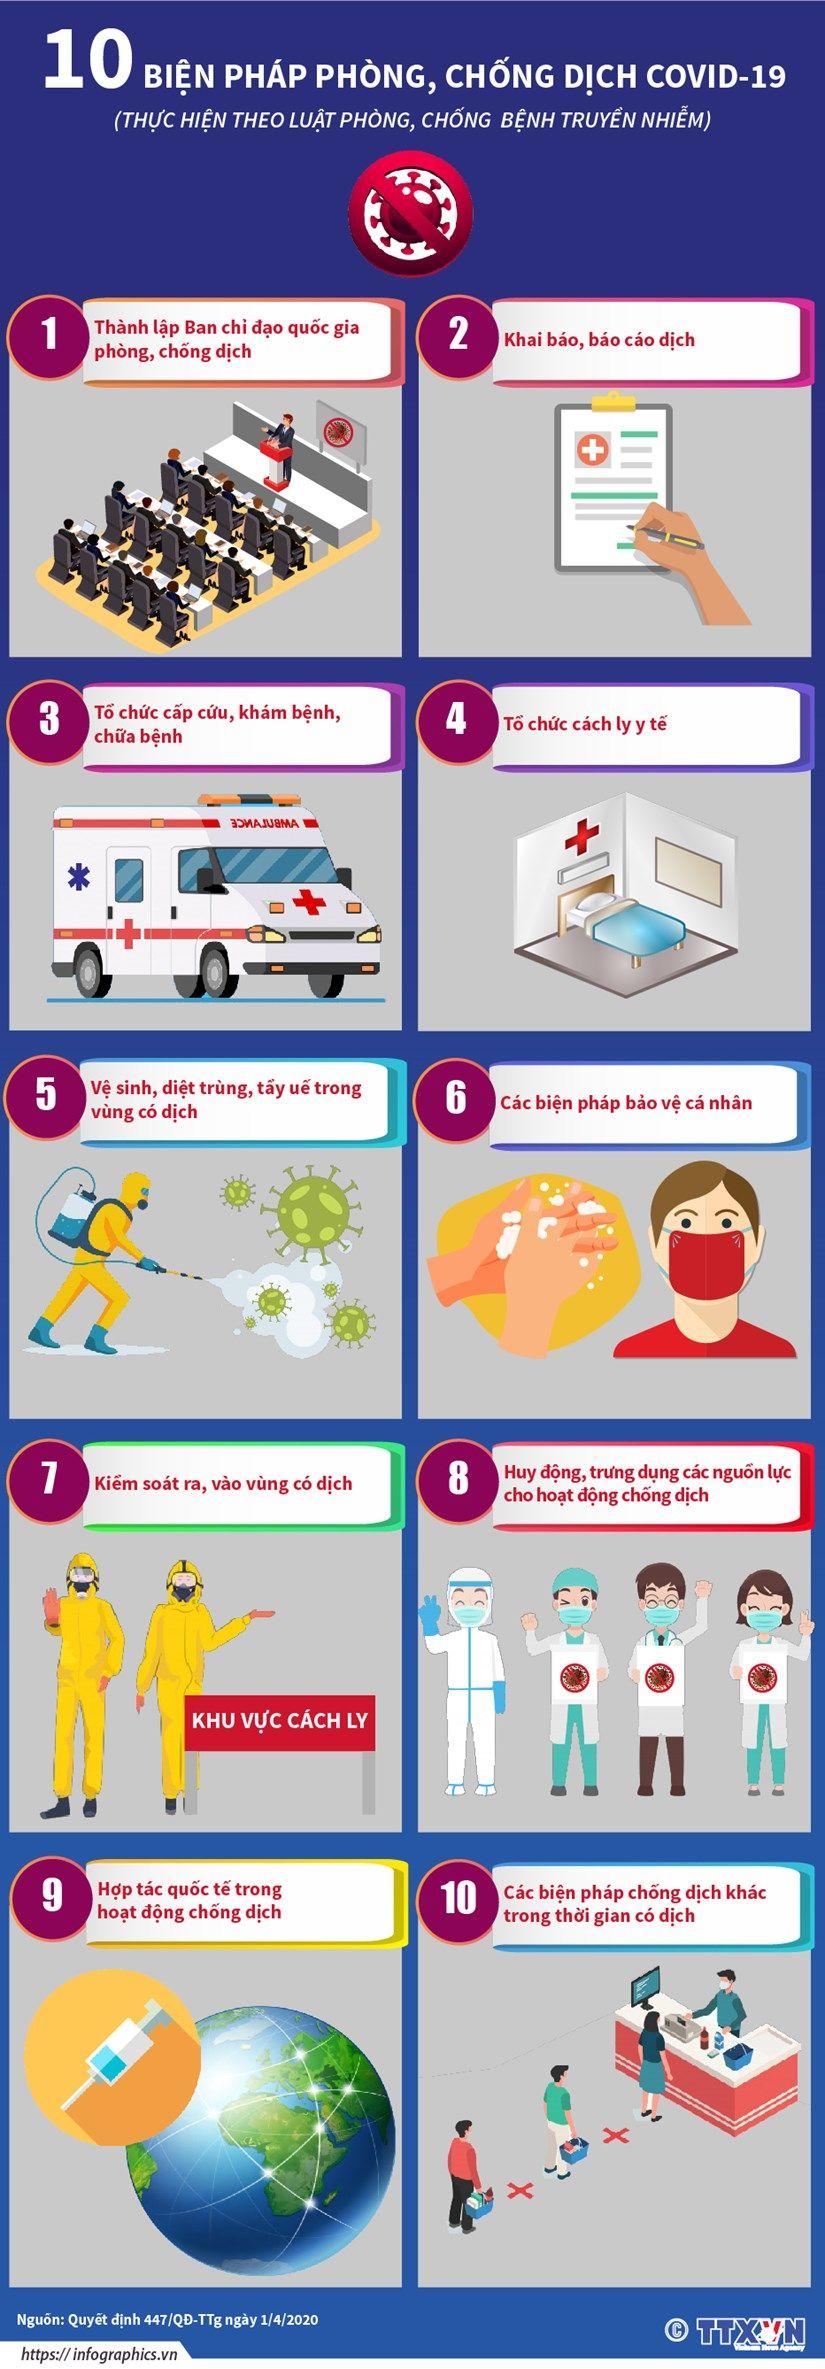 infographic 10 bien phap phong chong dich benh covid 19